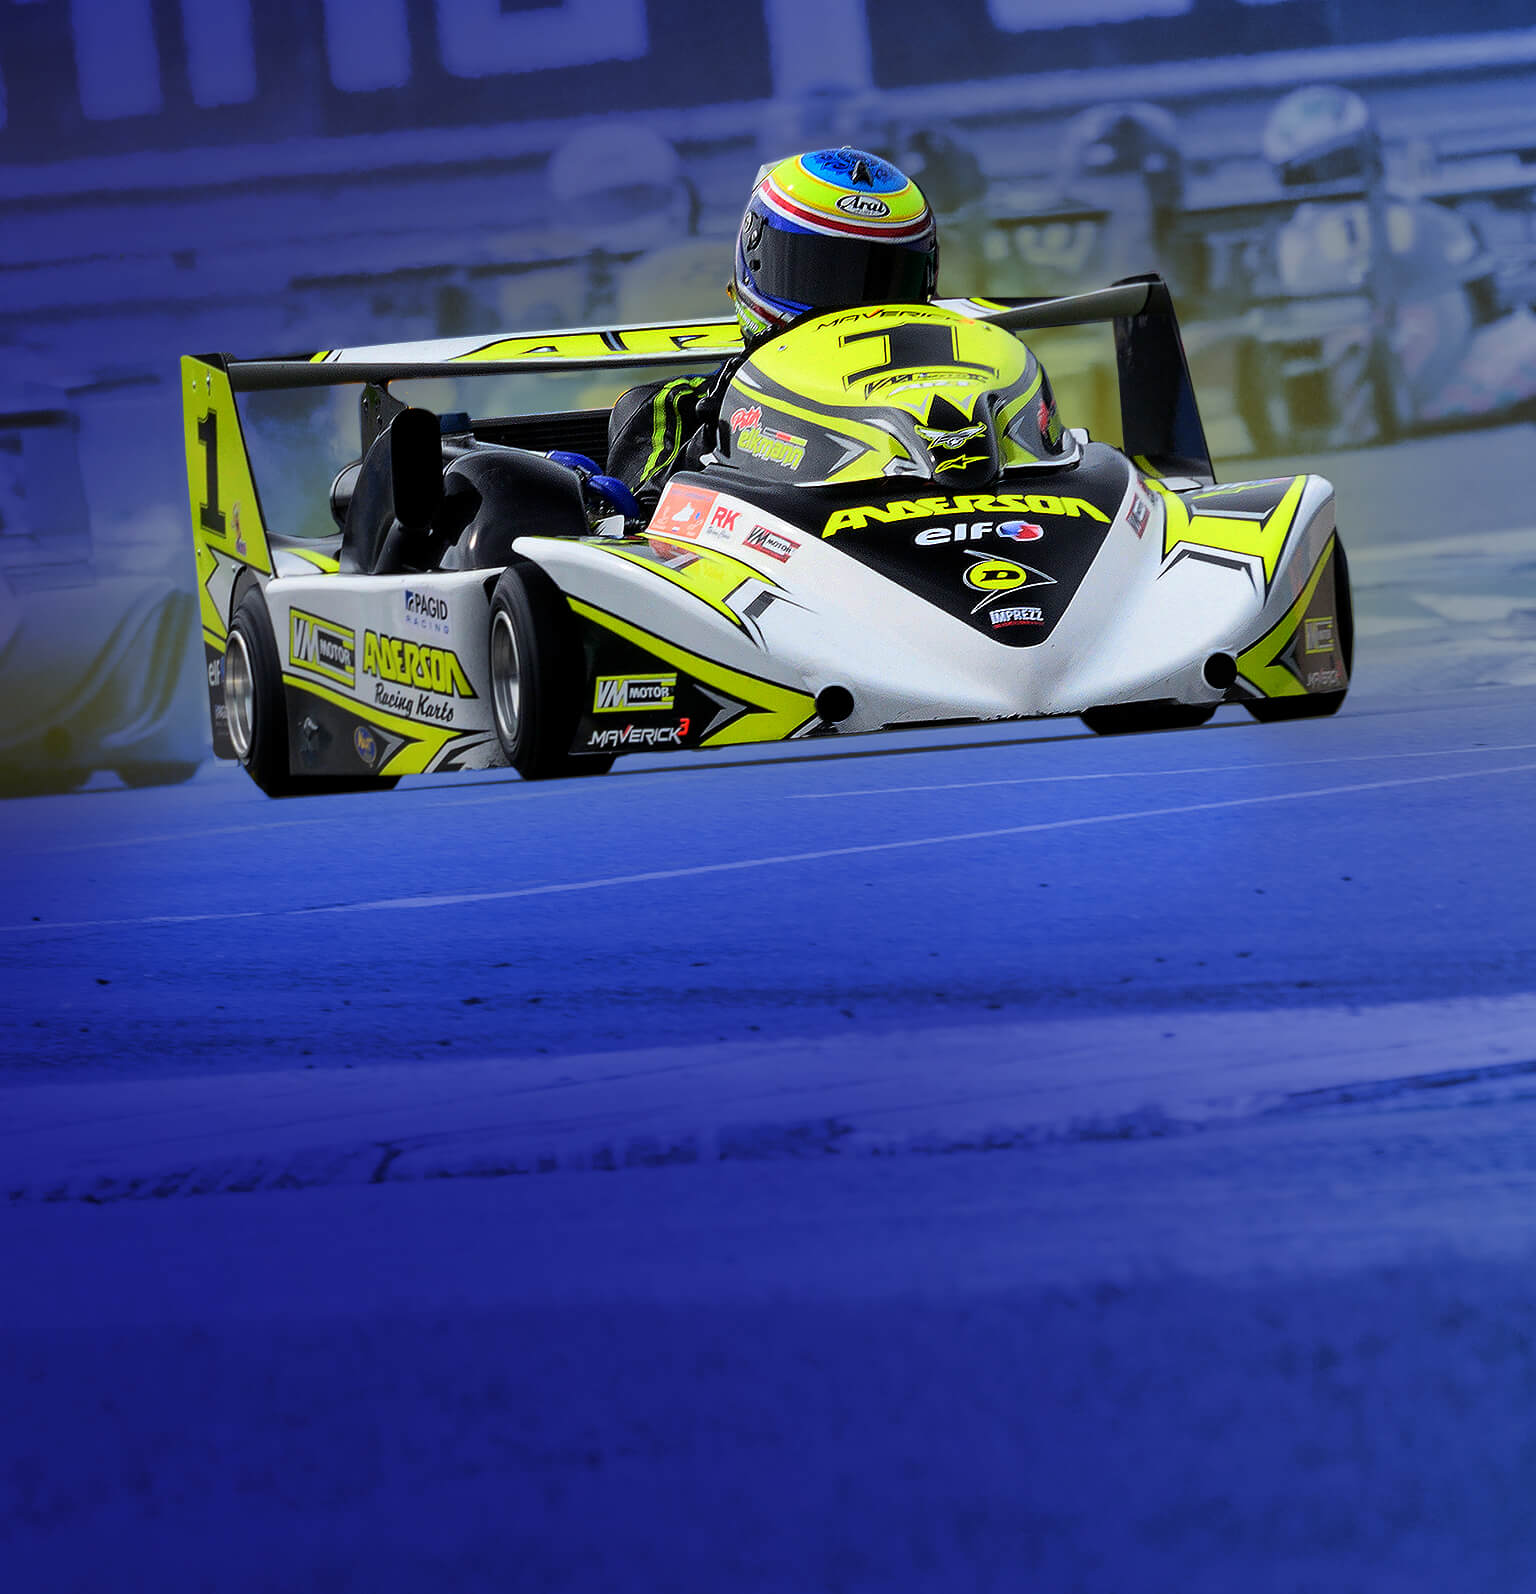 Anderson Racing Kart driven by Peter Elkmann